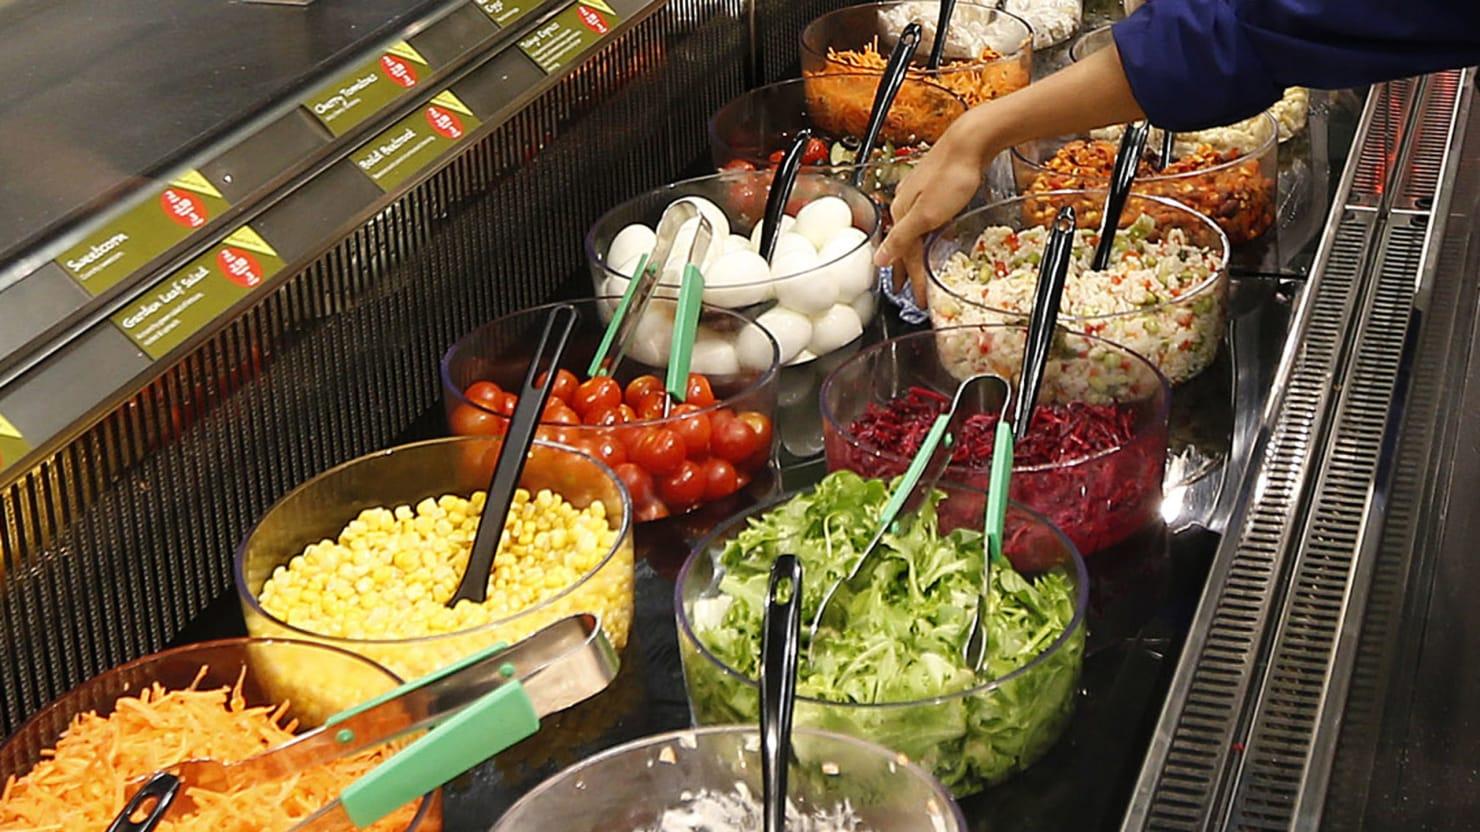 Restaurants Spread Norovirus The Daily Beast